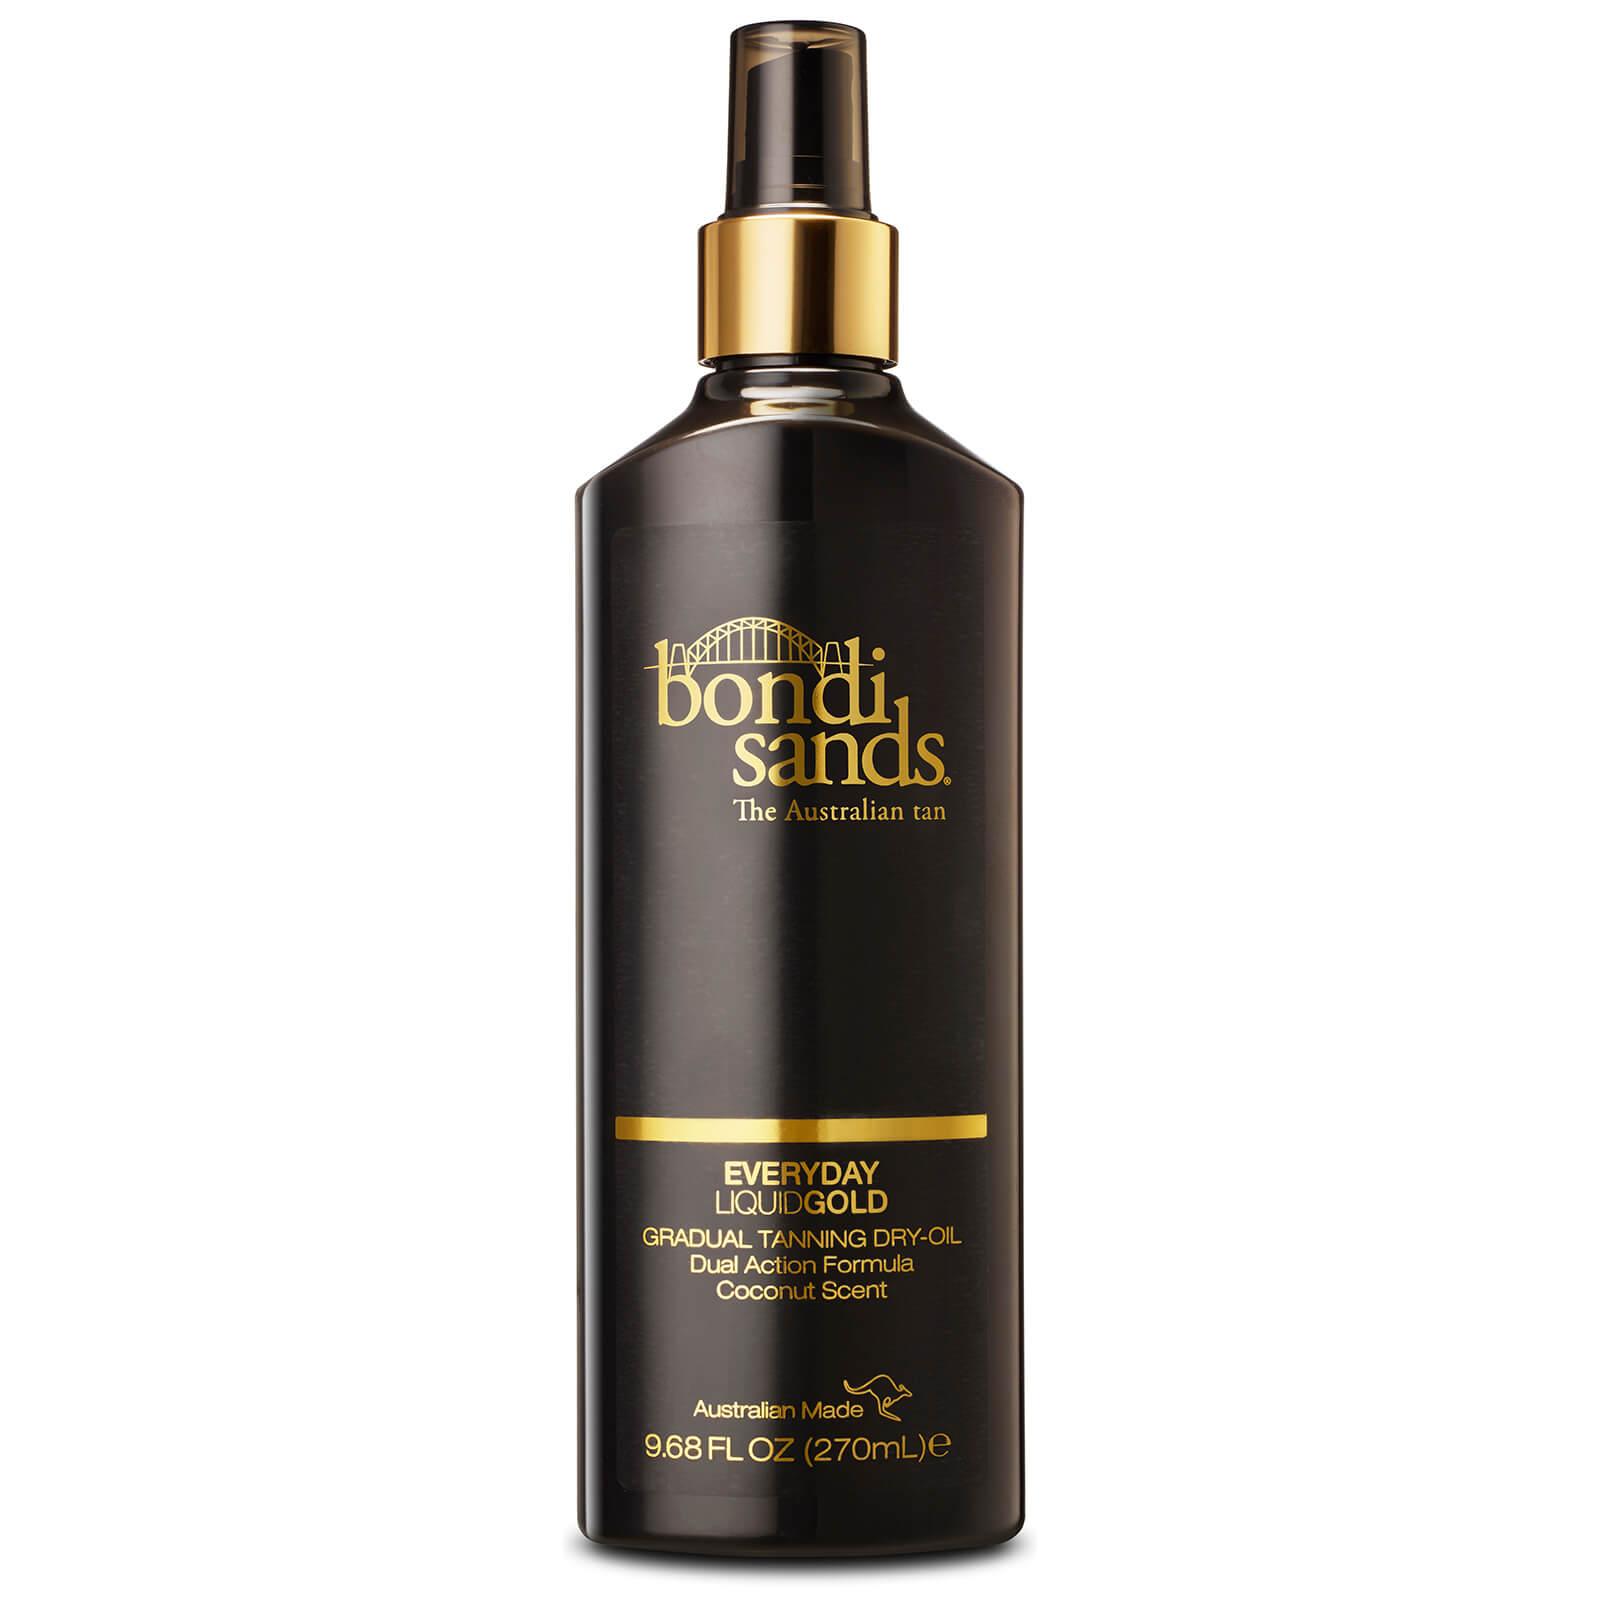 4685aafc879 Bondi Sands Everyday Liquid Gold Gradual Tanning Oil 270ml ...